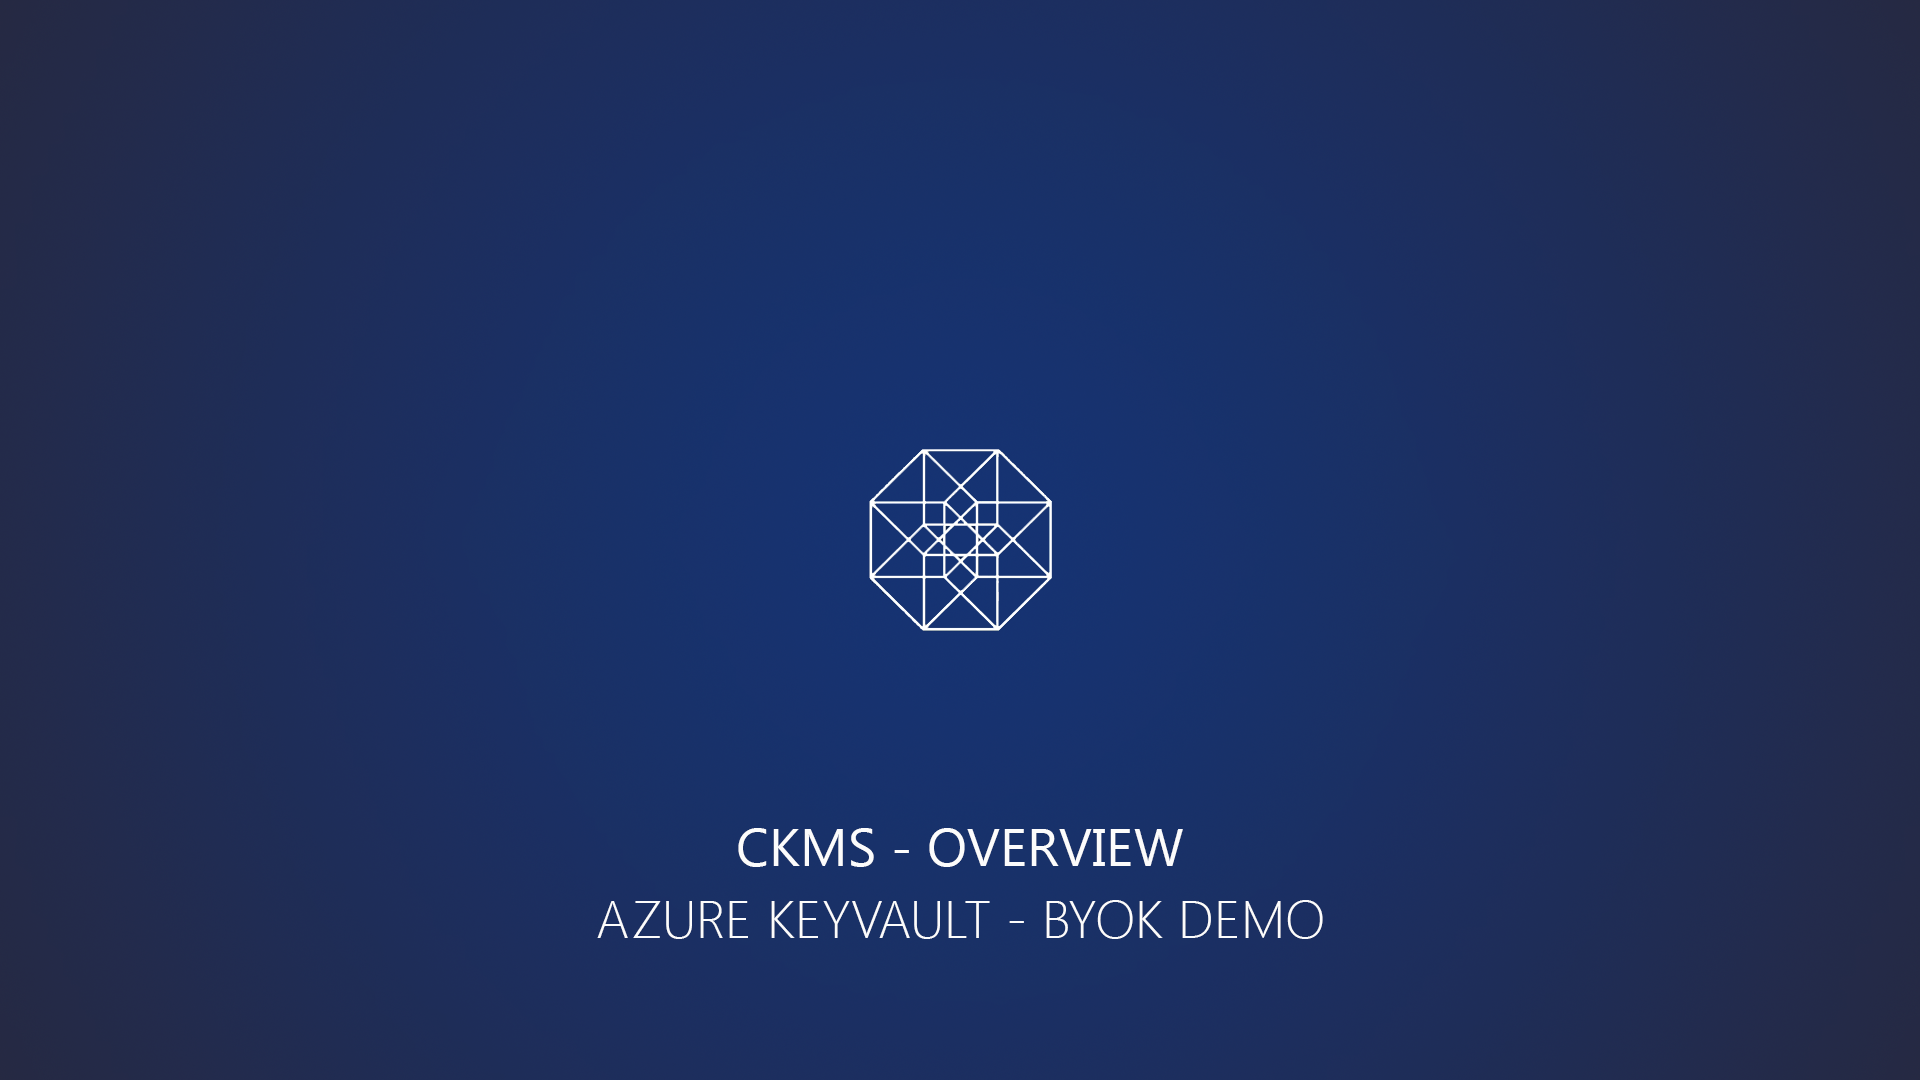 CKMS-Azure-Key-Vault-BYOK-Demo